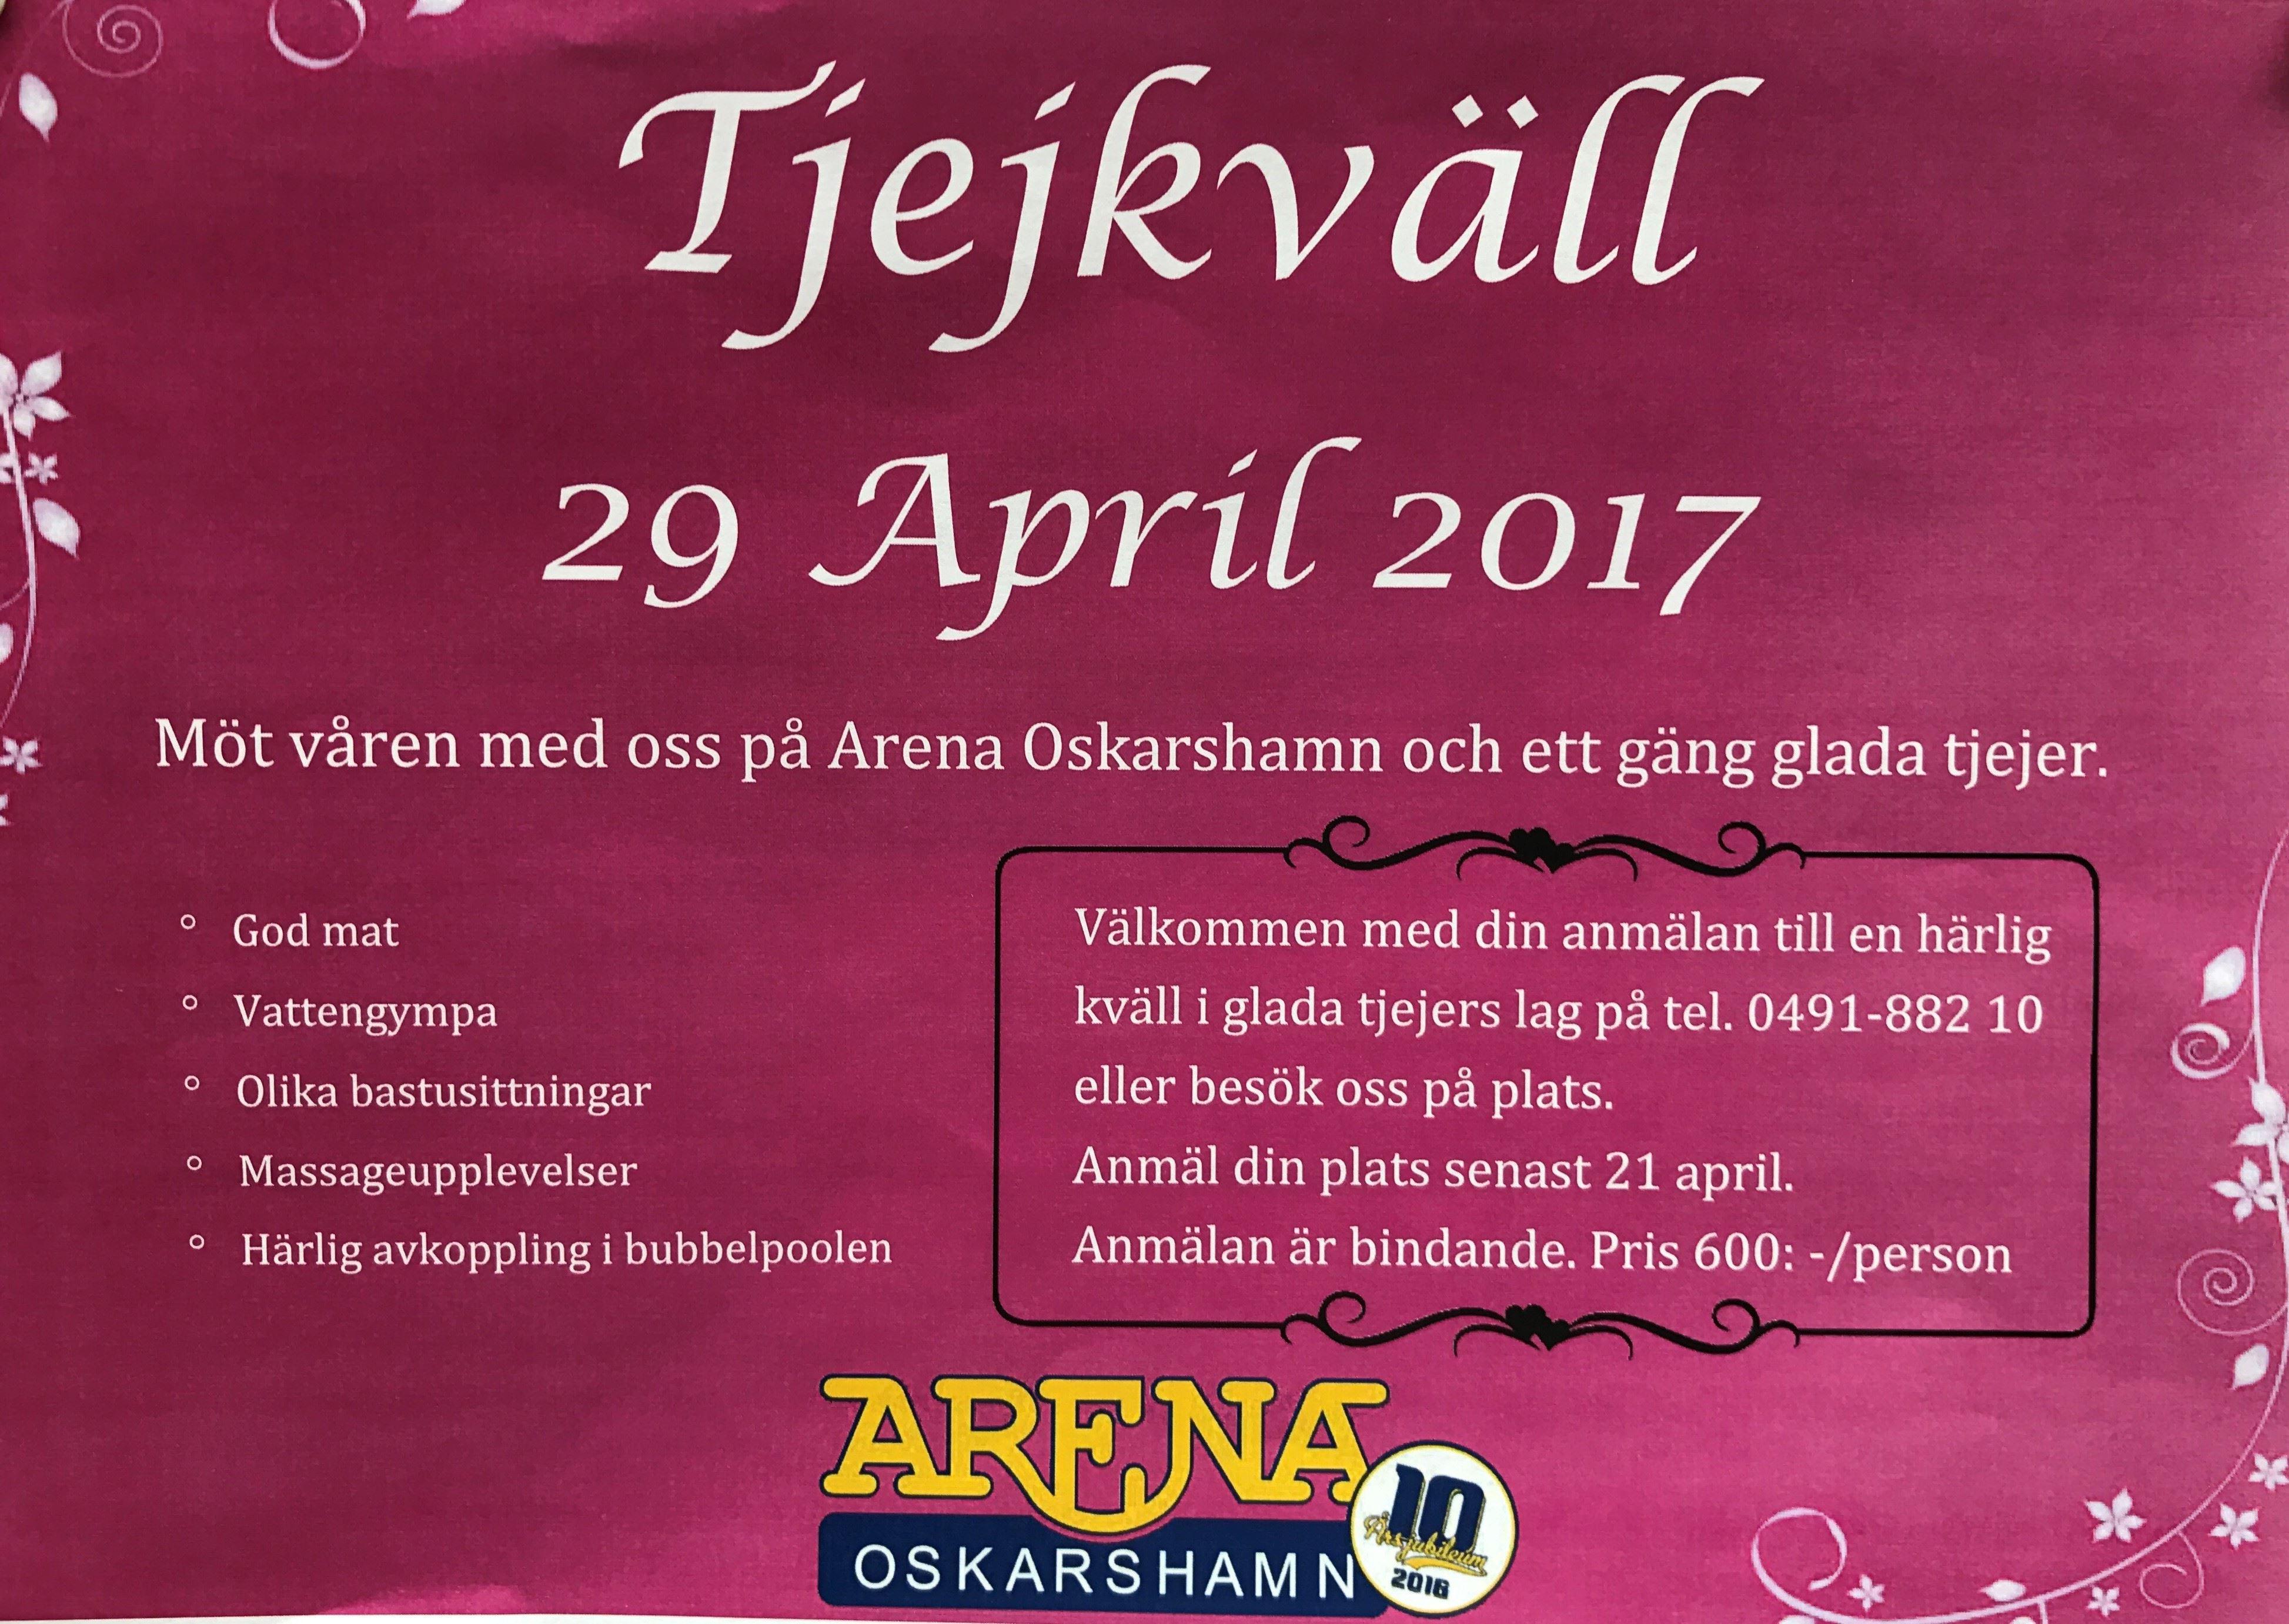 Tjejkväll på Arena Oskarshamn